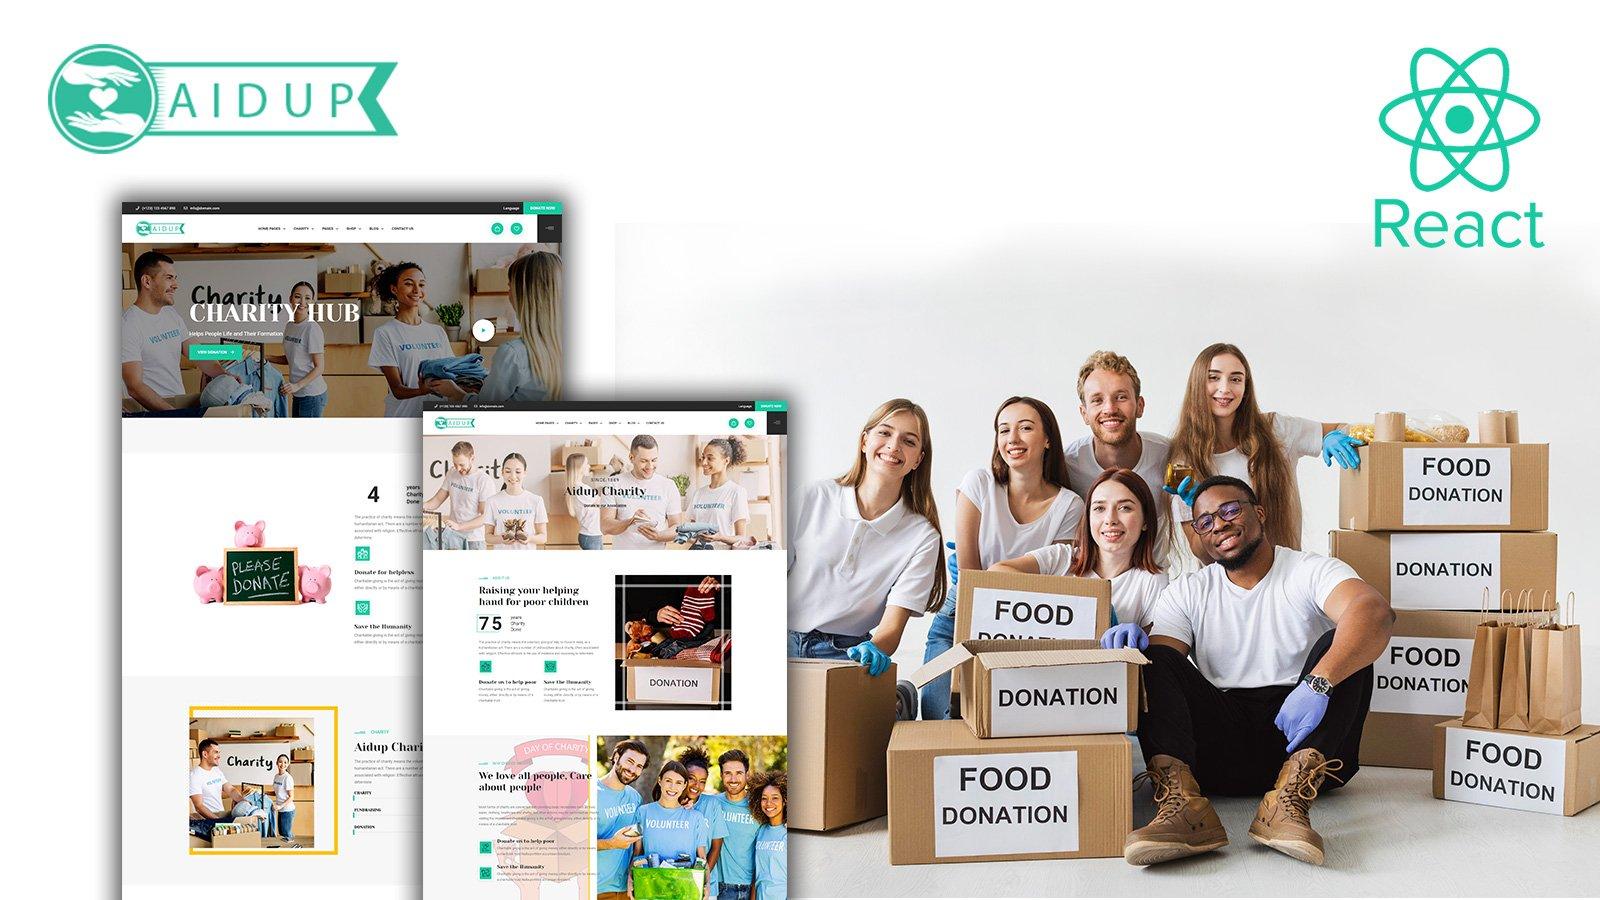 Aidup - Charity React webbplats mall